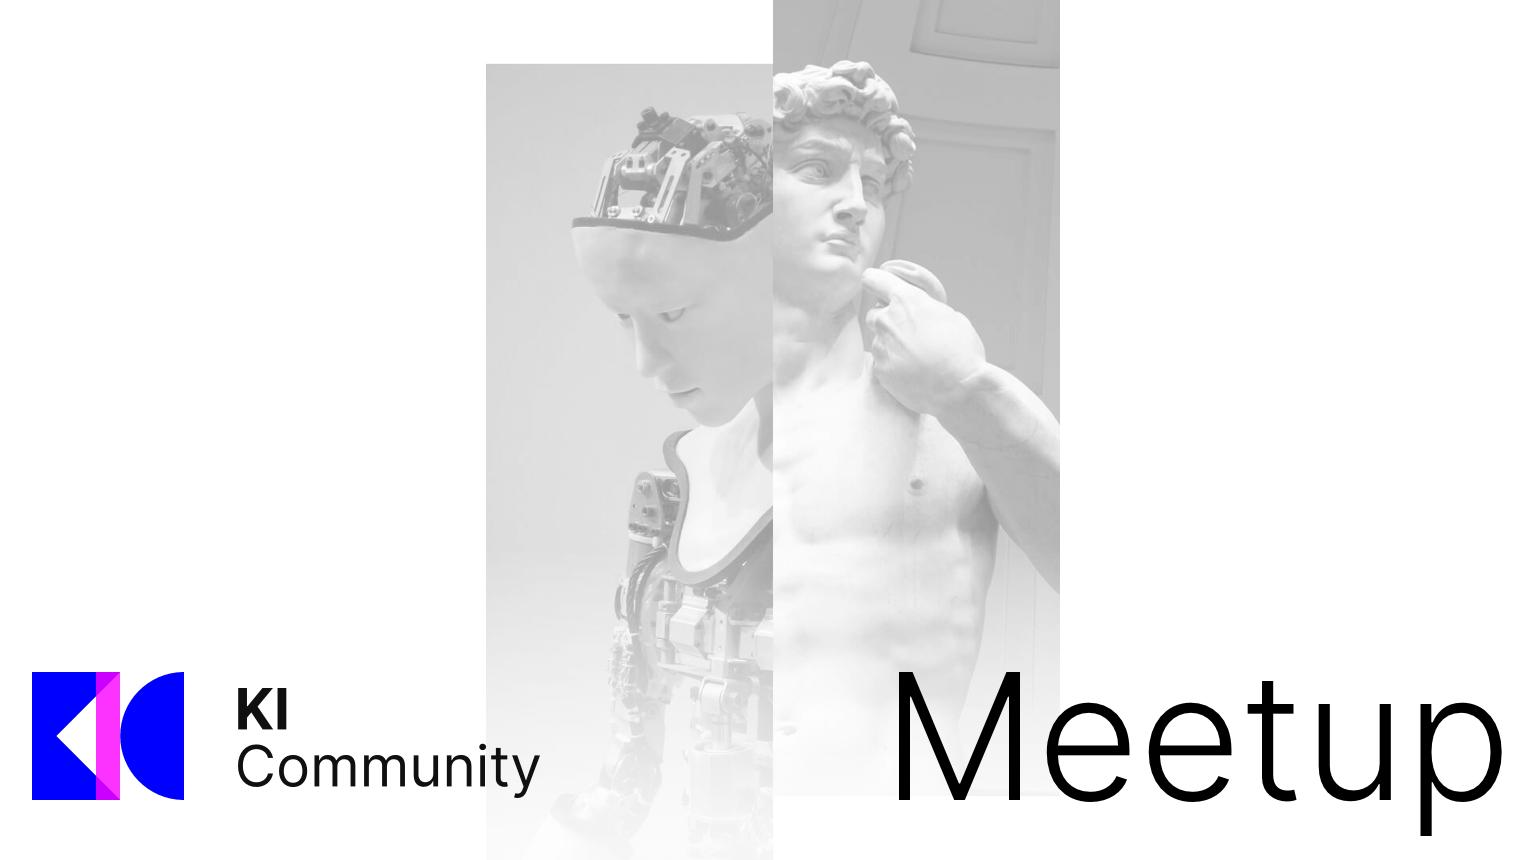 KI Community & Networking